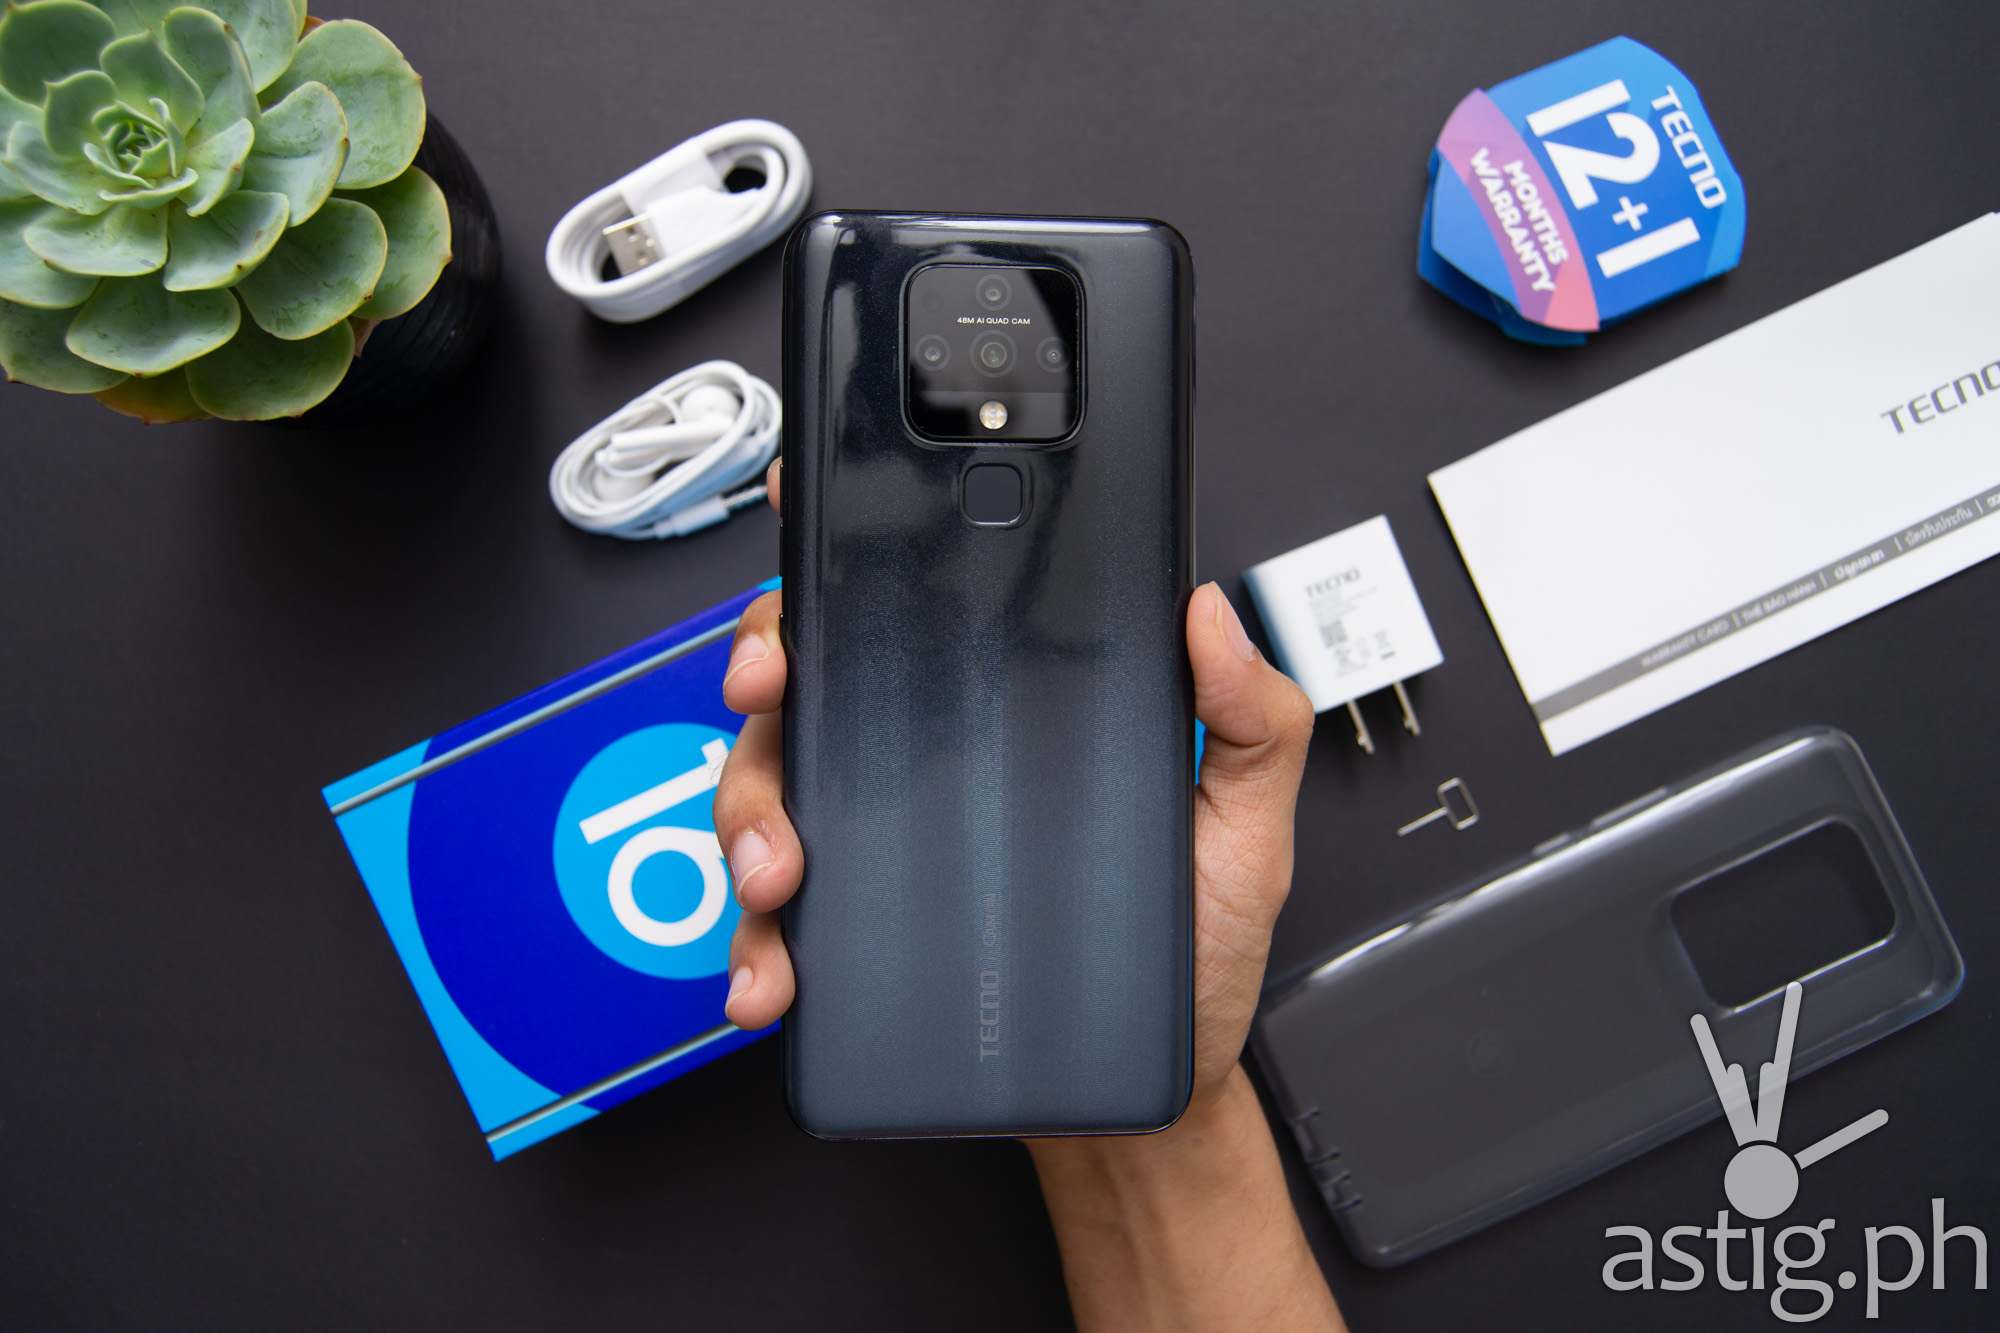 Back handheld - TECNO Camon 16 (Philippines)